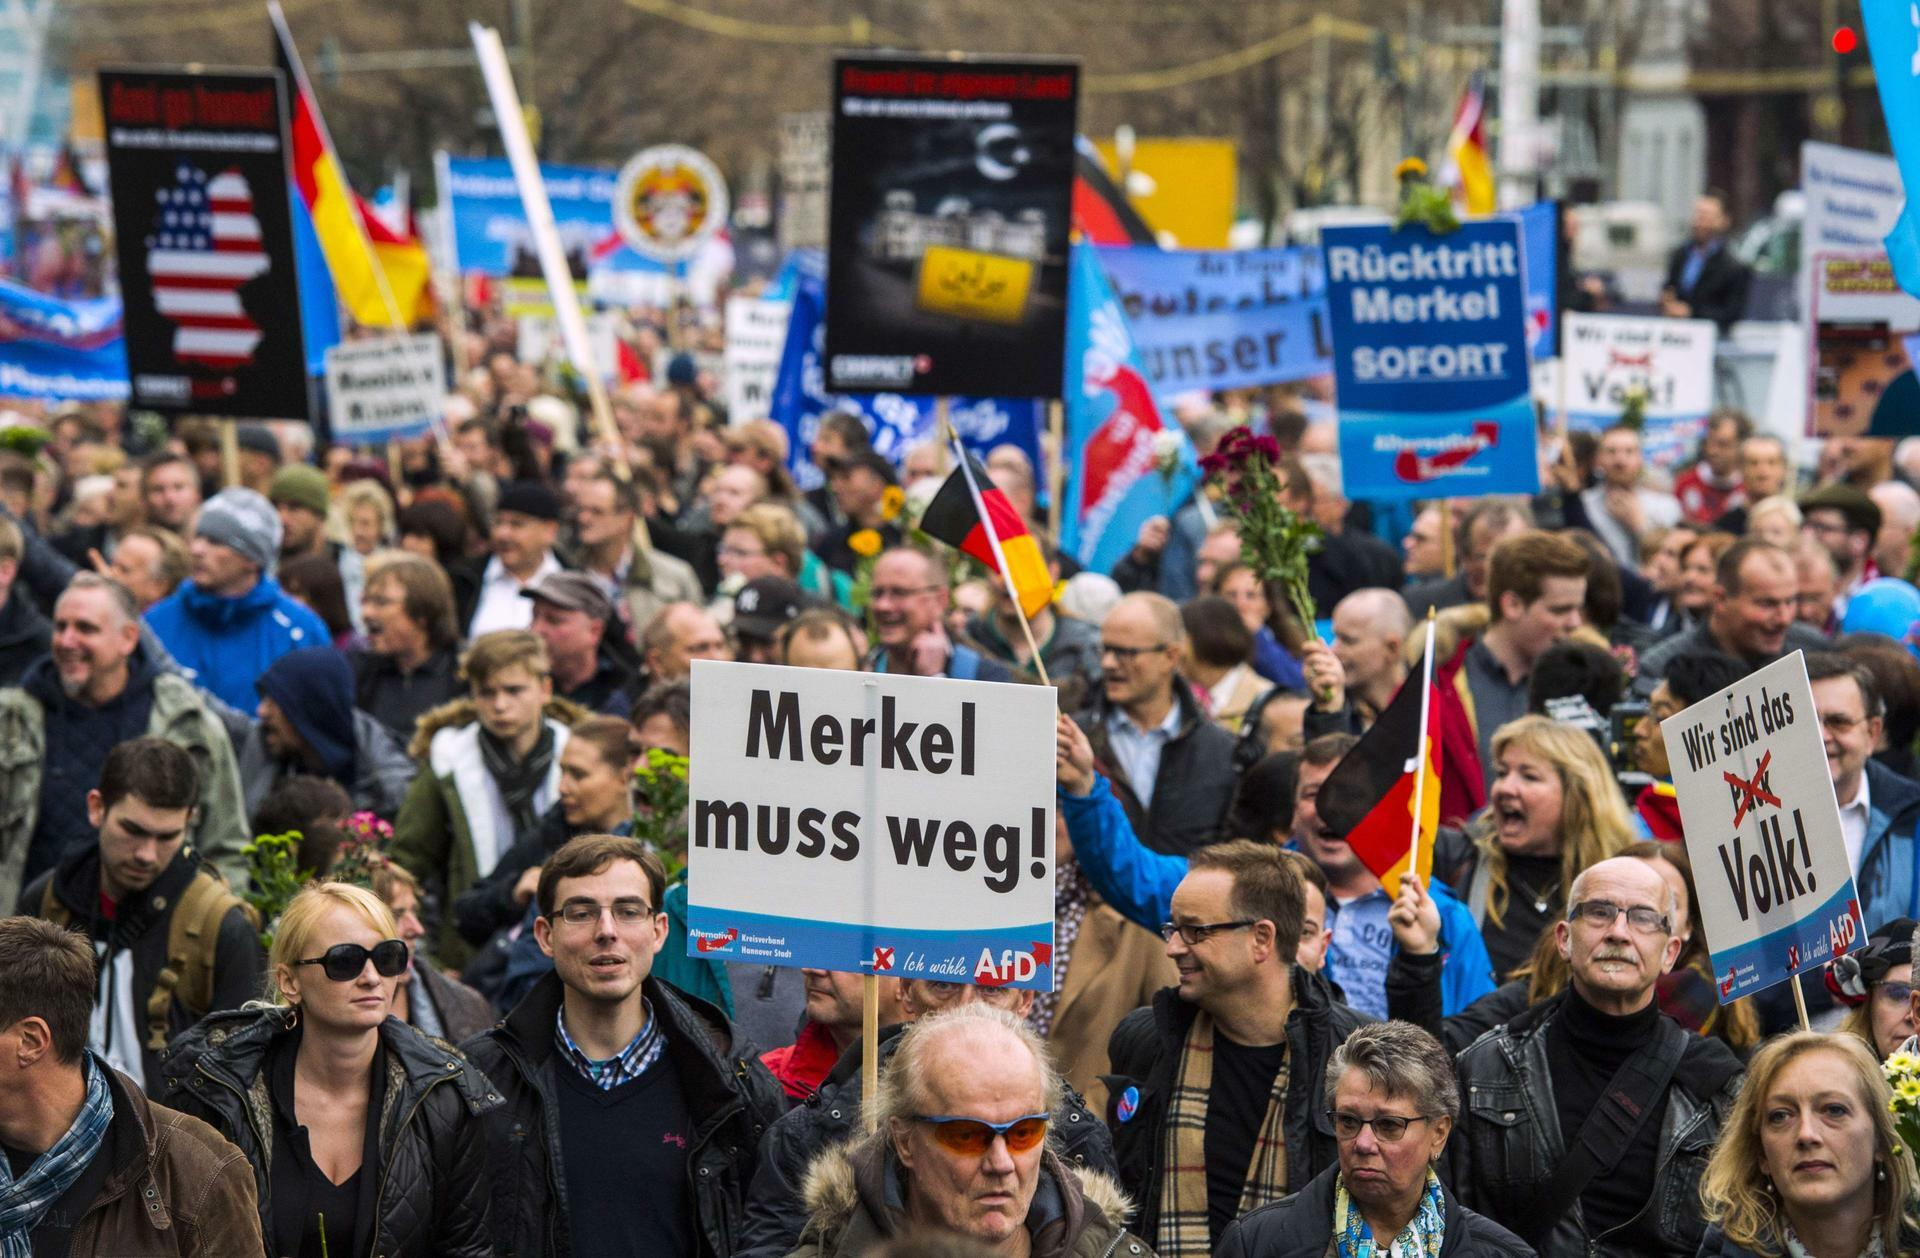 AfD-Protest gegen Flüchtlingspolitik: 5000 Demonstranten fordern Merkels  Rücktritt